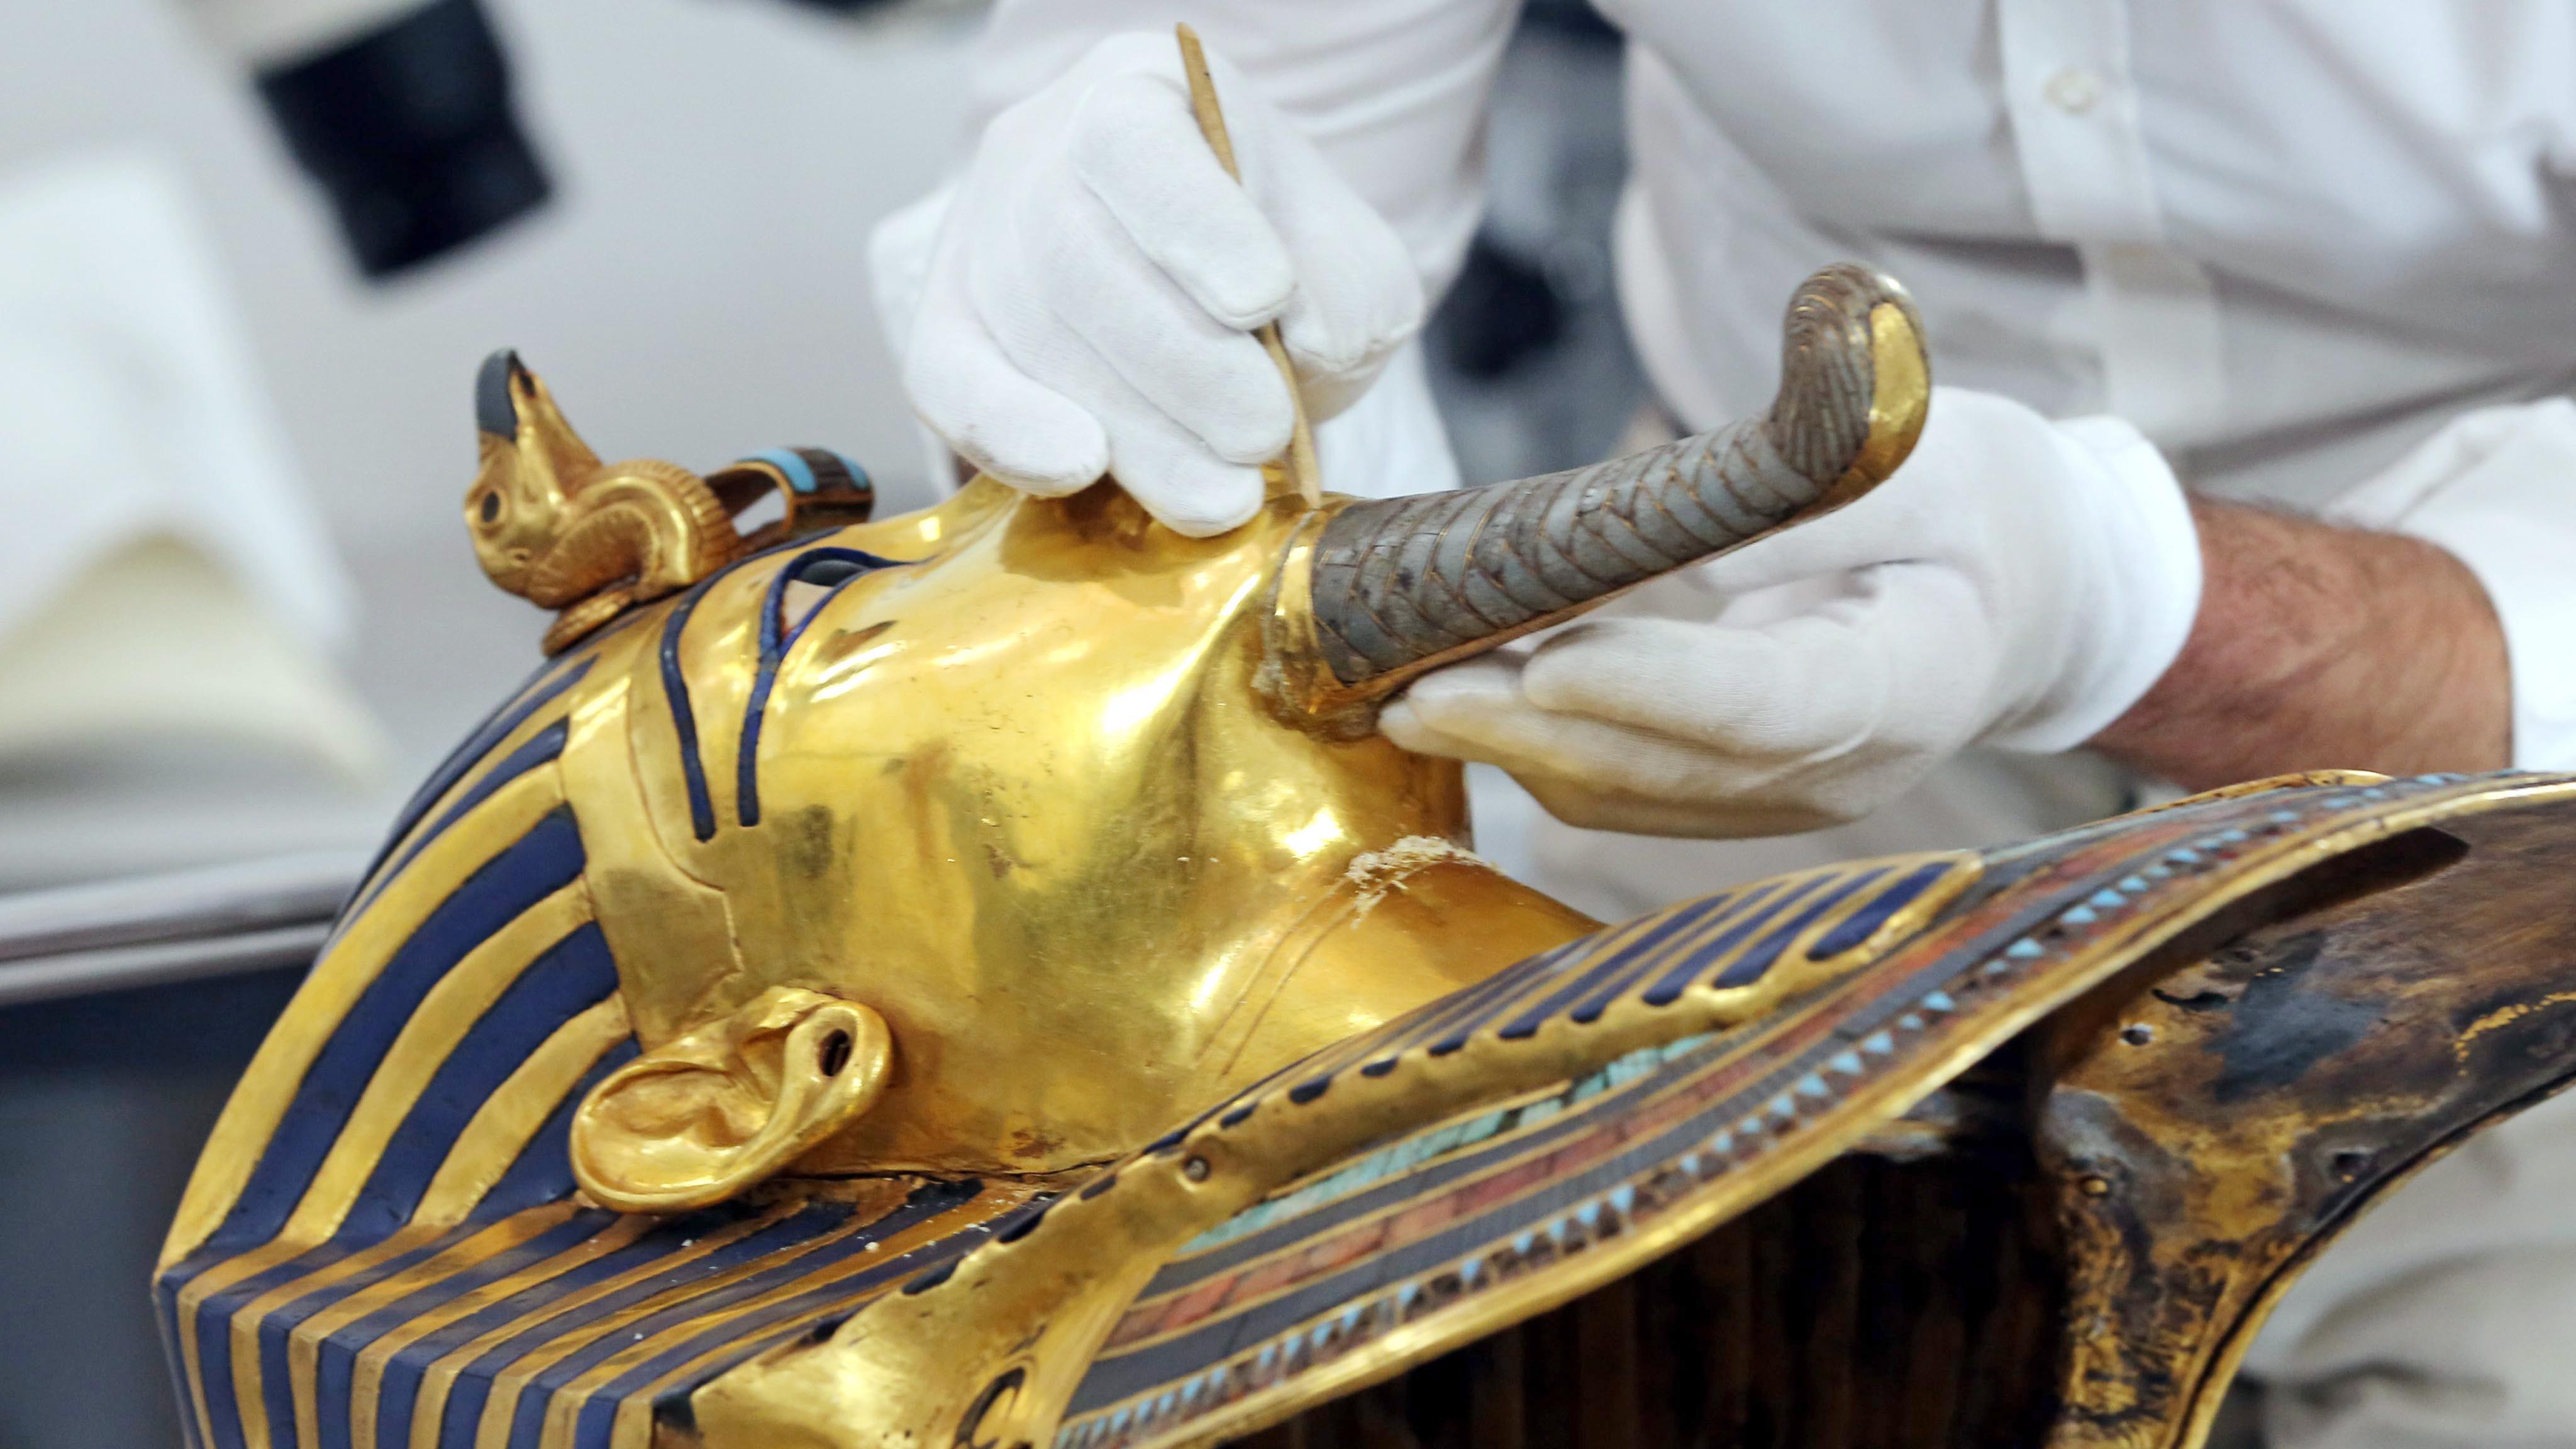 Ägypten: Grabkammer des Kult-Pharaos Tutanchamun neu restauriert